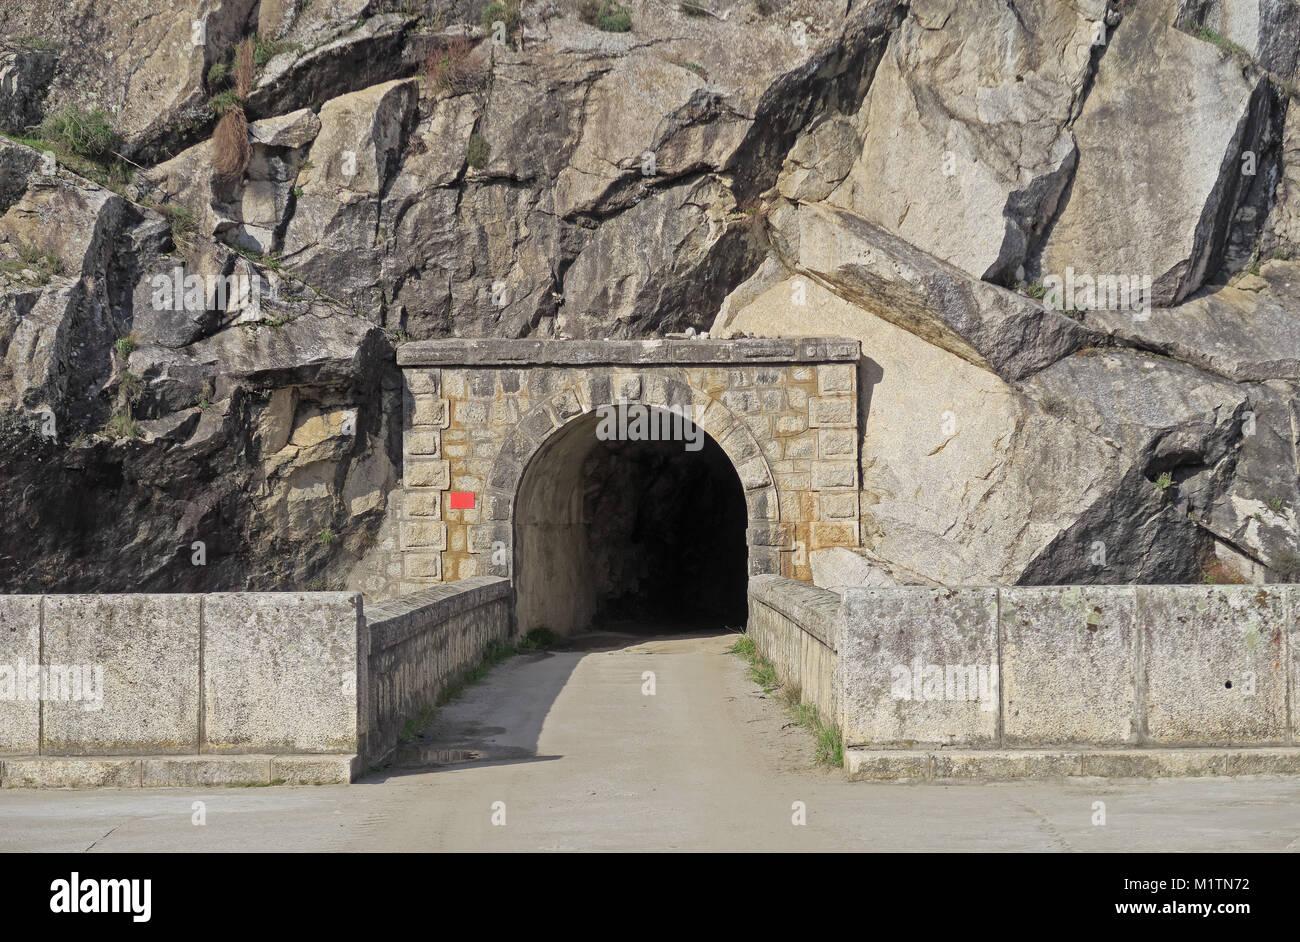 tunnel through mountain side, a winter bat roost  Embalse del Jandula, Parque Natural Sierra de Andujar, Jaen, Spain - Stock Image